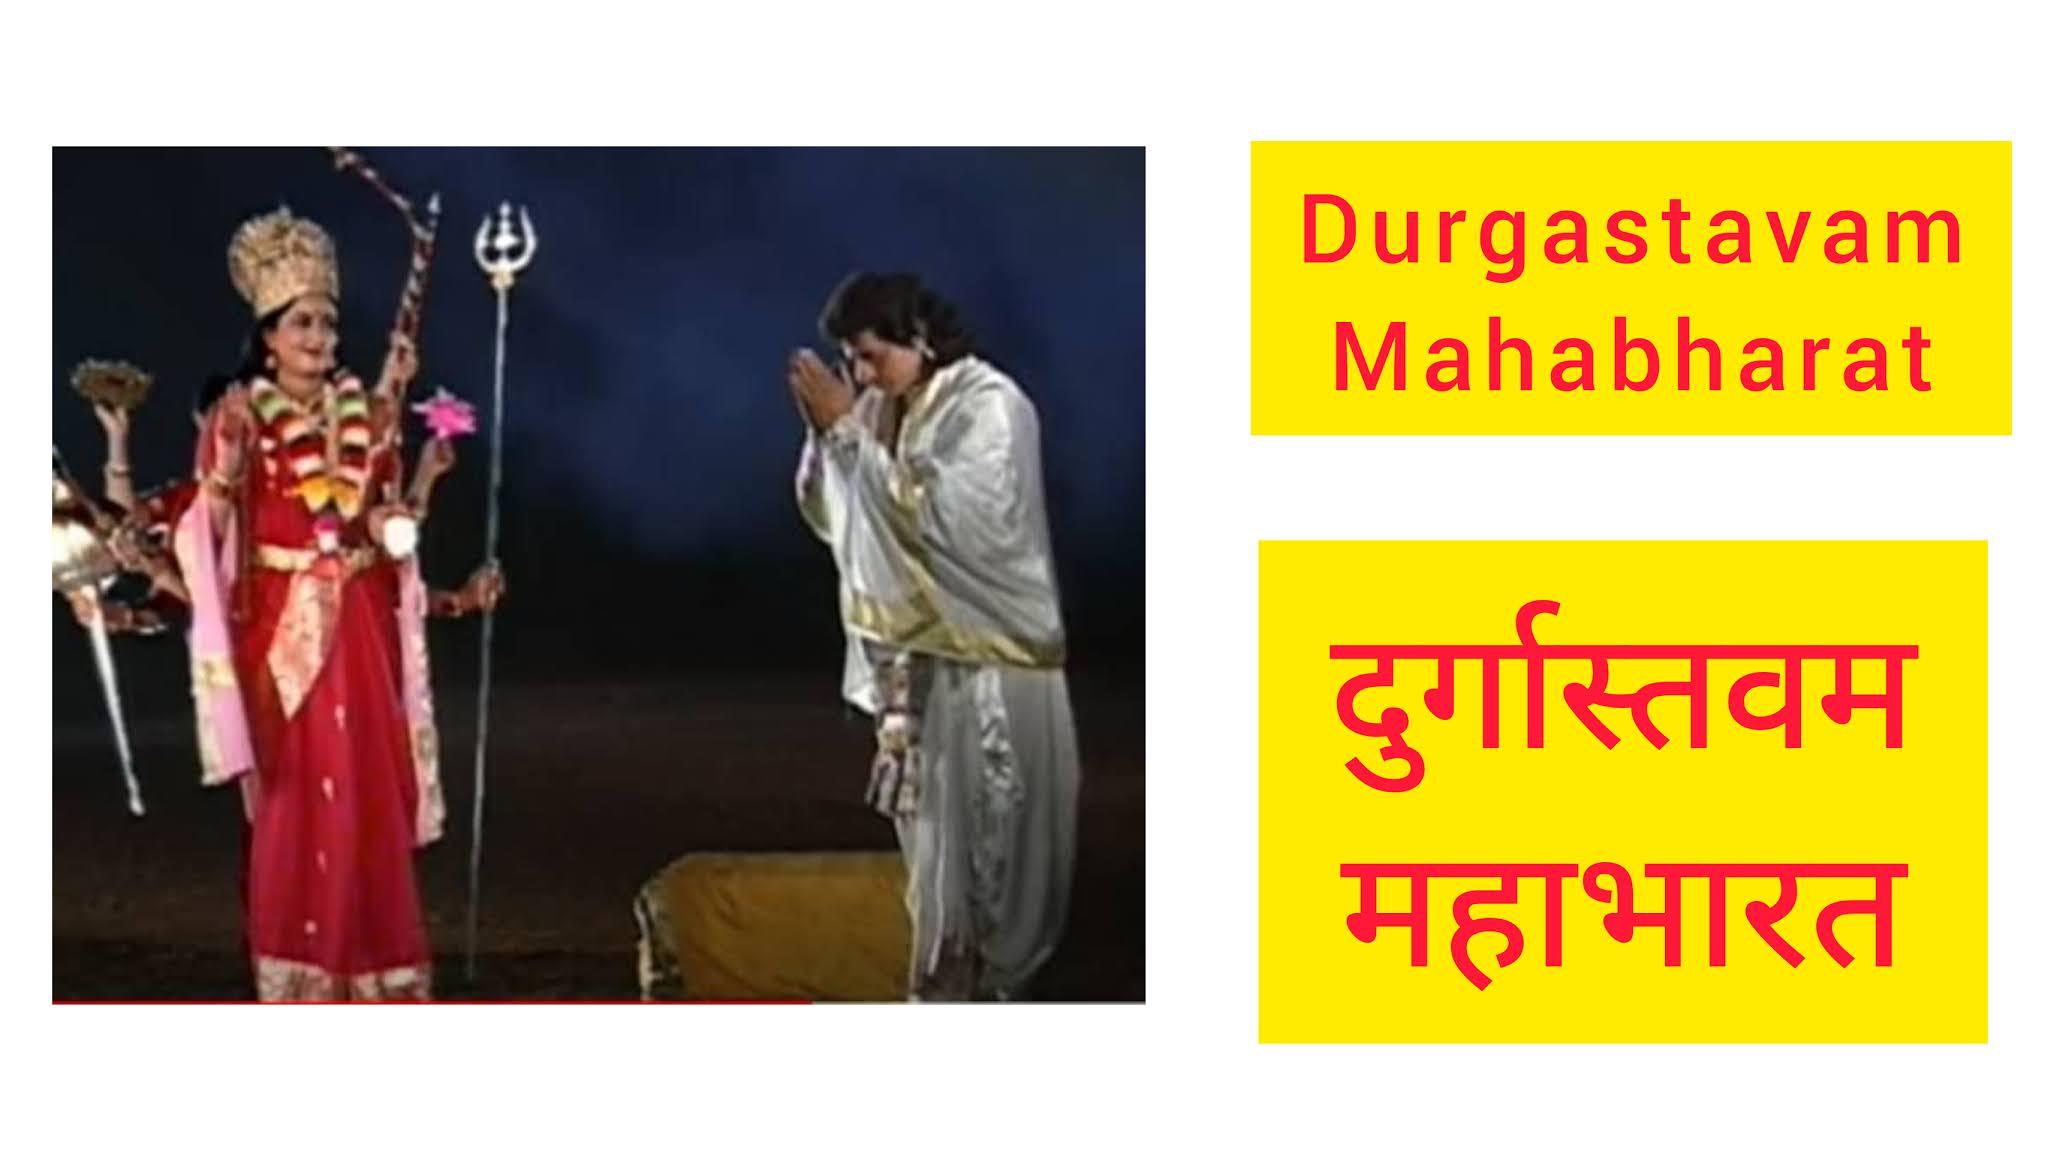 Durgastavam (Mahabharata) दुर्गास्तवम् महाभारतान्तर्गतम् in Sanskrit